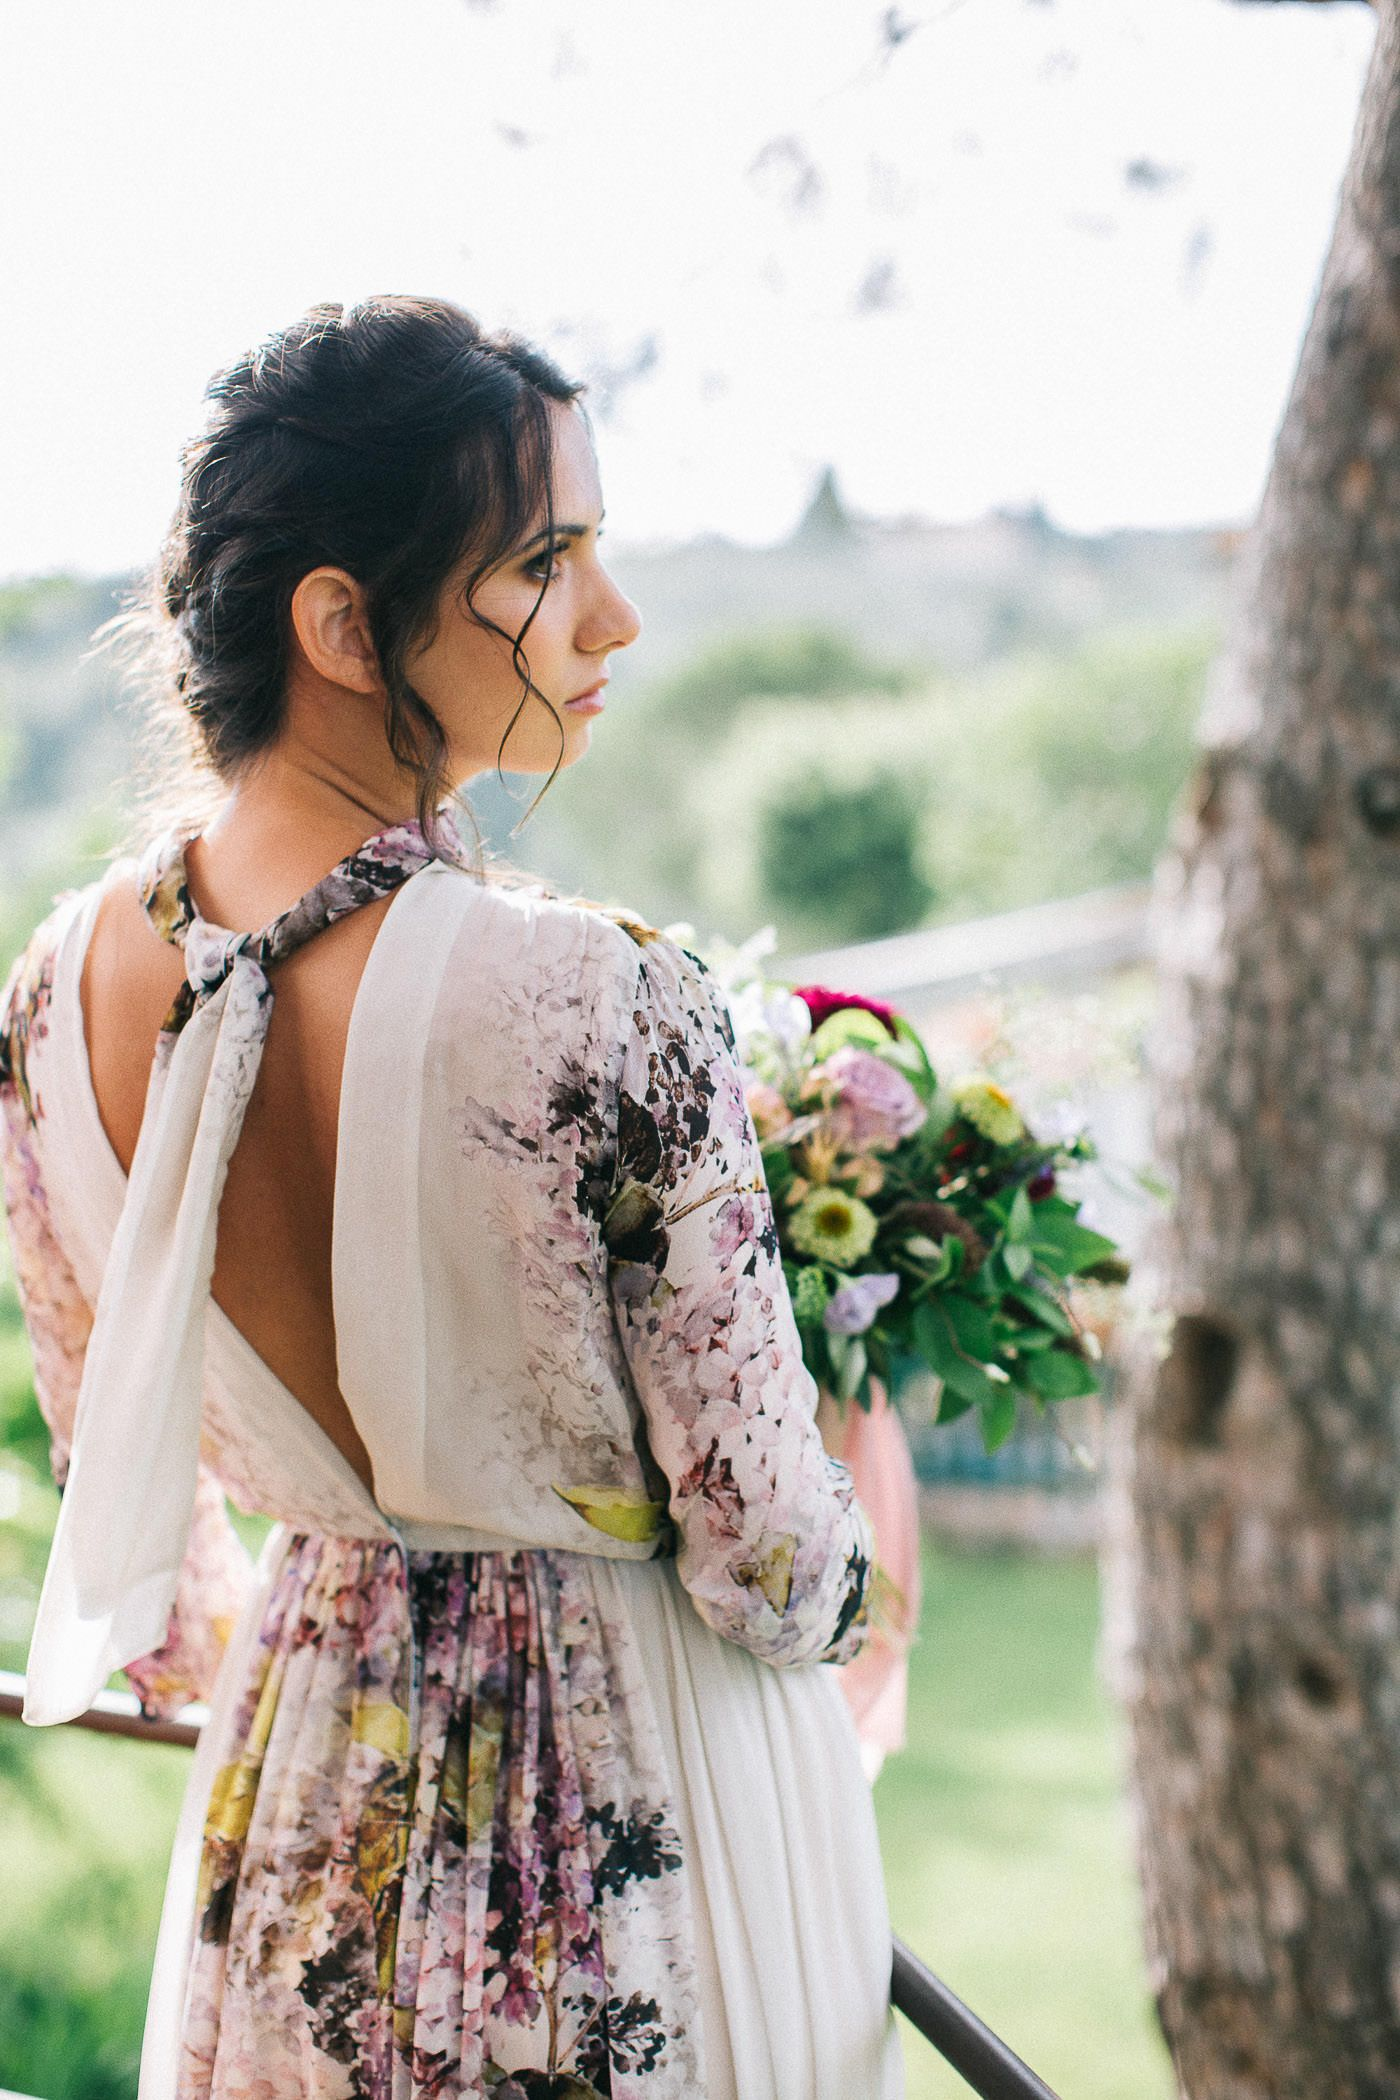 Floral print wedding dresses  Floral Print Wedding Dress  Wedding dress Bridal shoot and Weddings